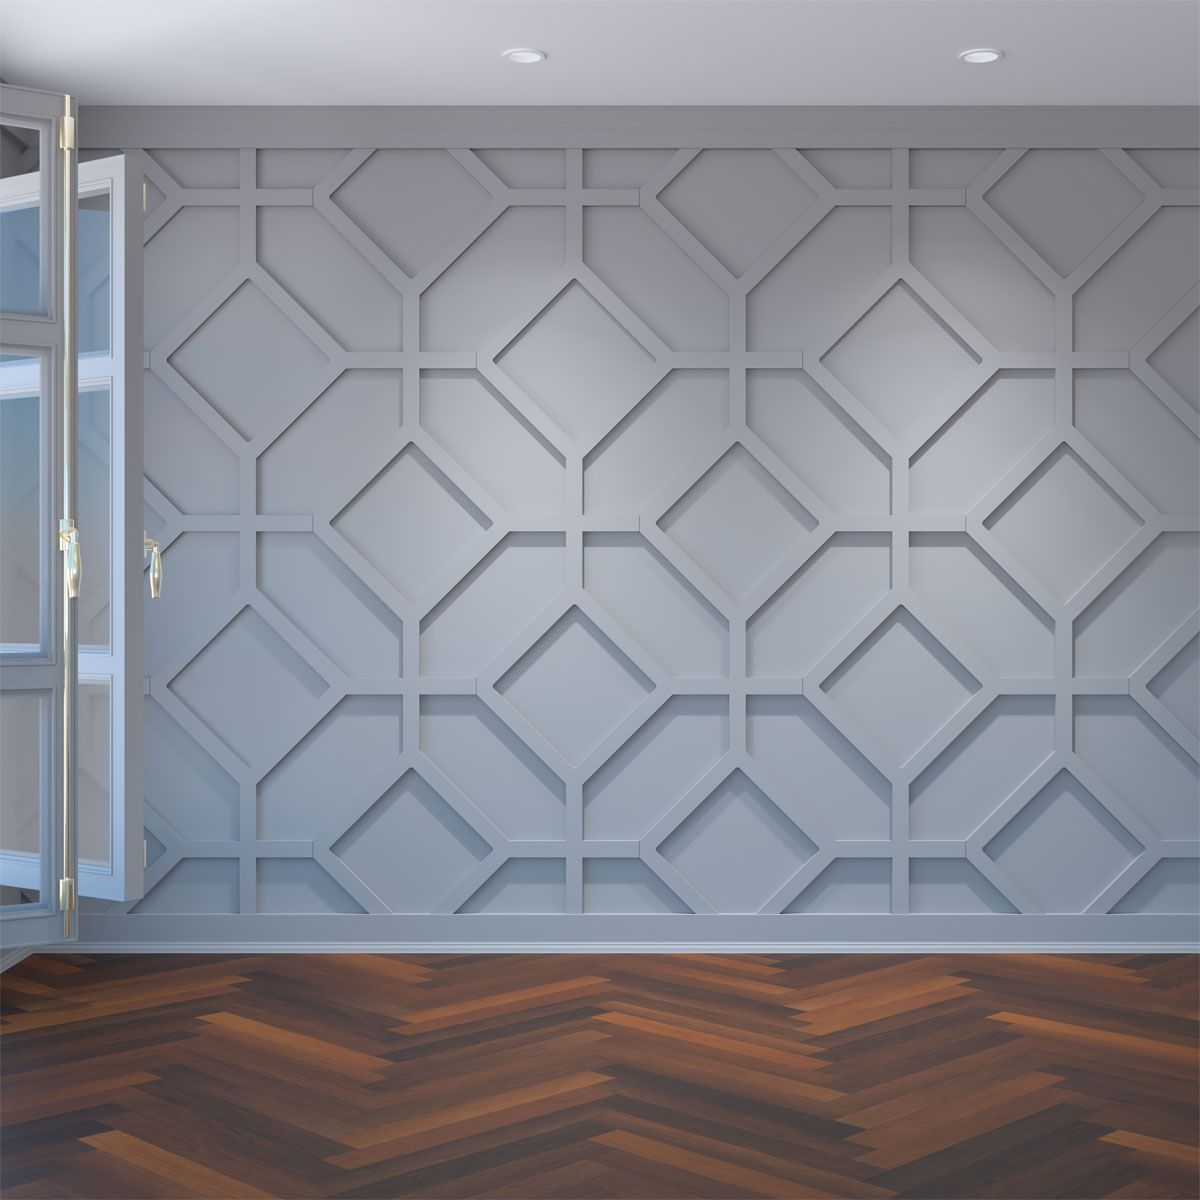 Large Cameron Decorative Fretwork Wall Panels In Architectural Grade Pvc Walmart Com In 2020 Pvc Wall Panels Decorative Wall Panels Pvc Wall